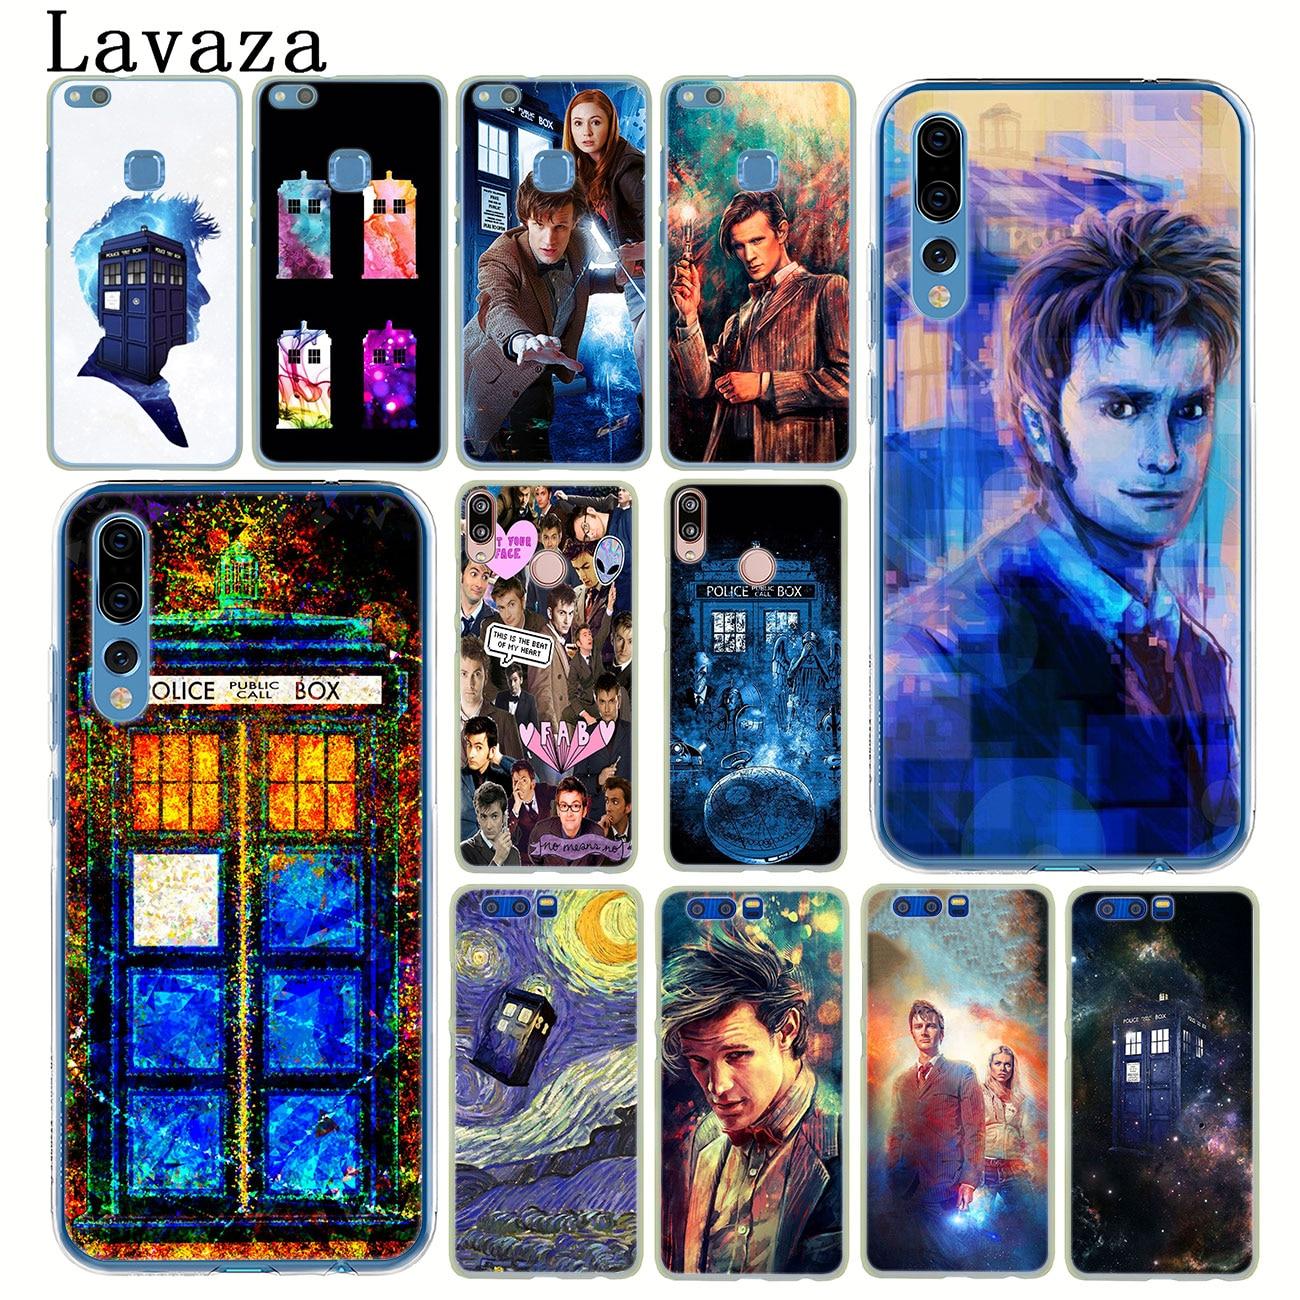 Lavaza Tardis Box Doctor who Phone Case for Huawei P30 P20 Pro P9 P10 Plus P8 Lite Mini 2016 2017 P smart Z 2019 Cover